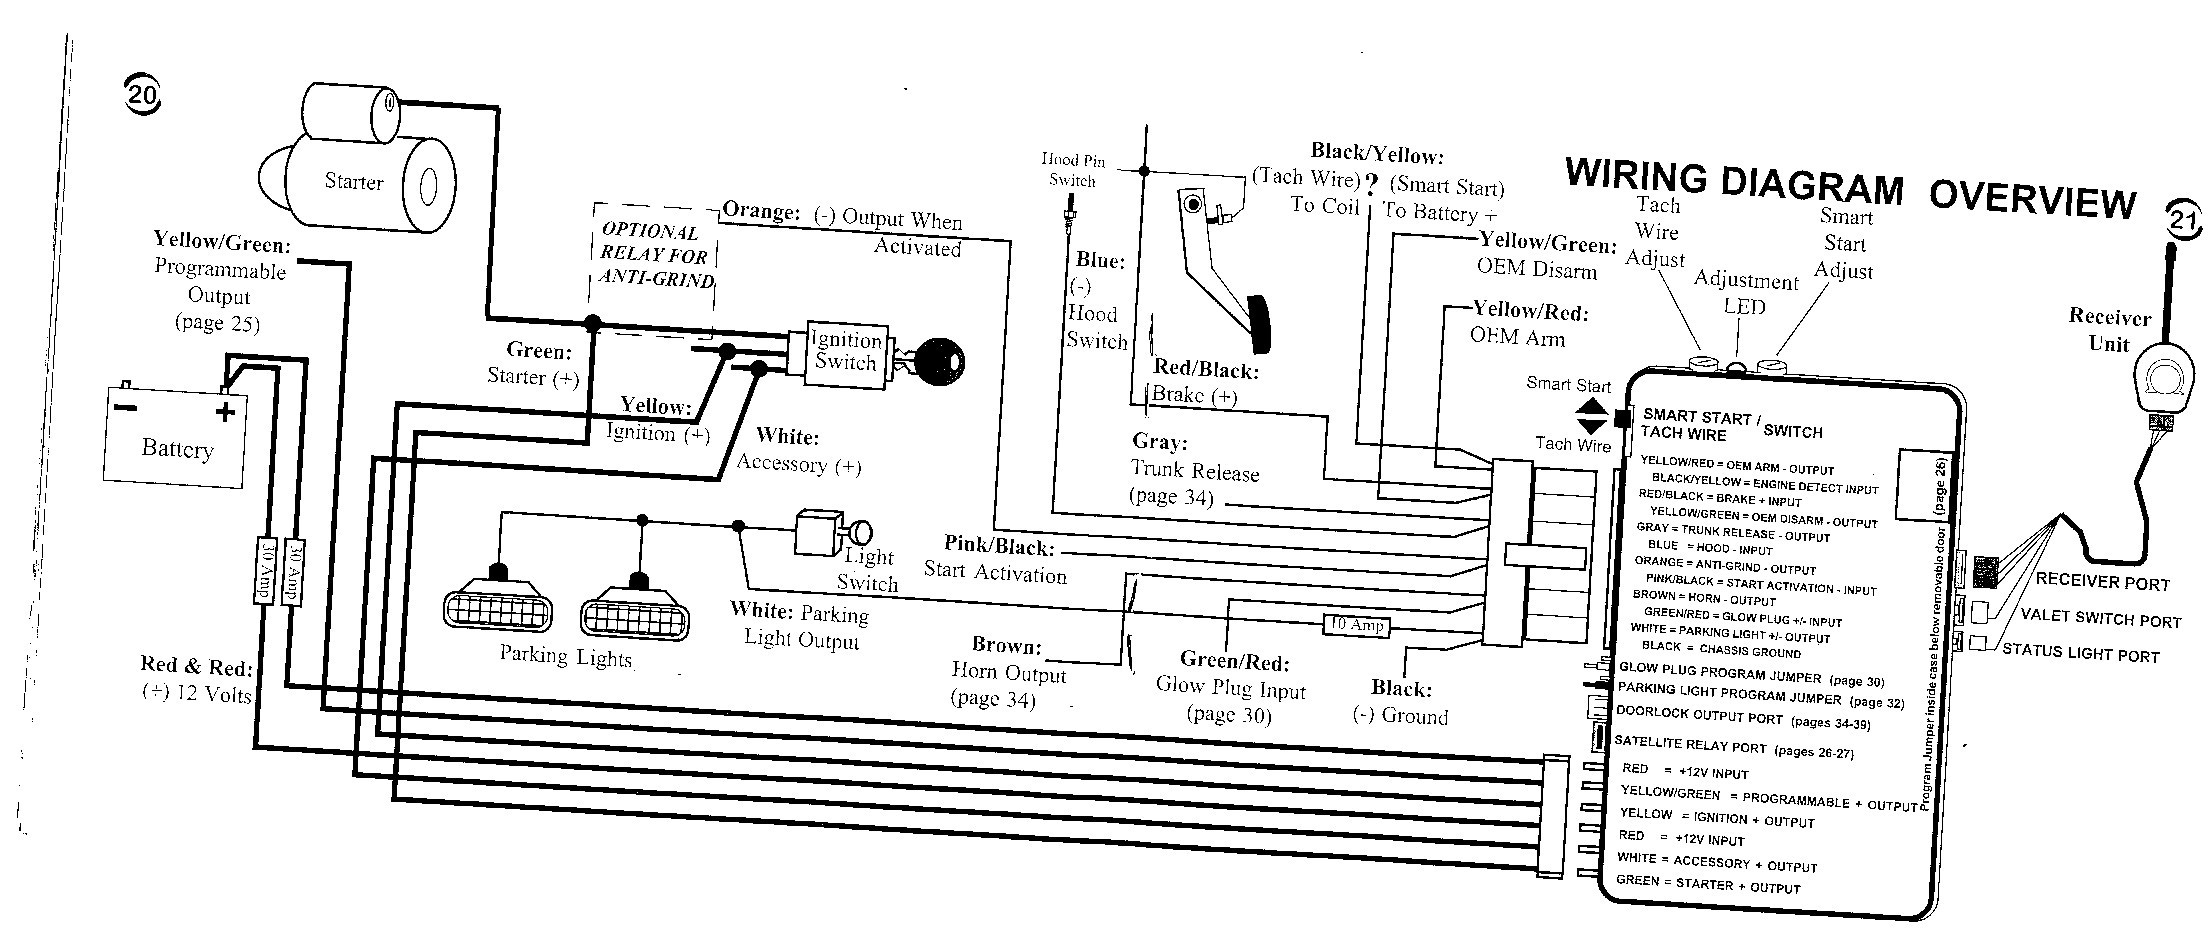 Viper 5706v Installation Guide Diagram Viper 5901 Wiring Diagram Of Viper 5706v Installation Guide Diagram